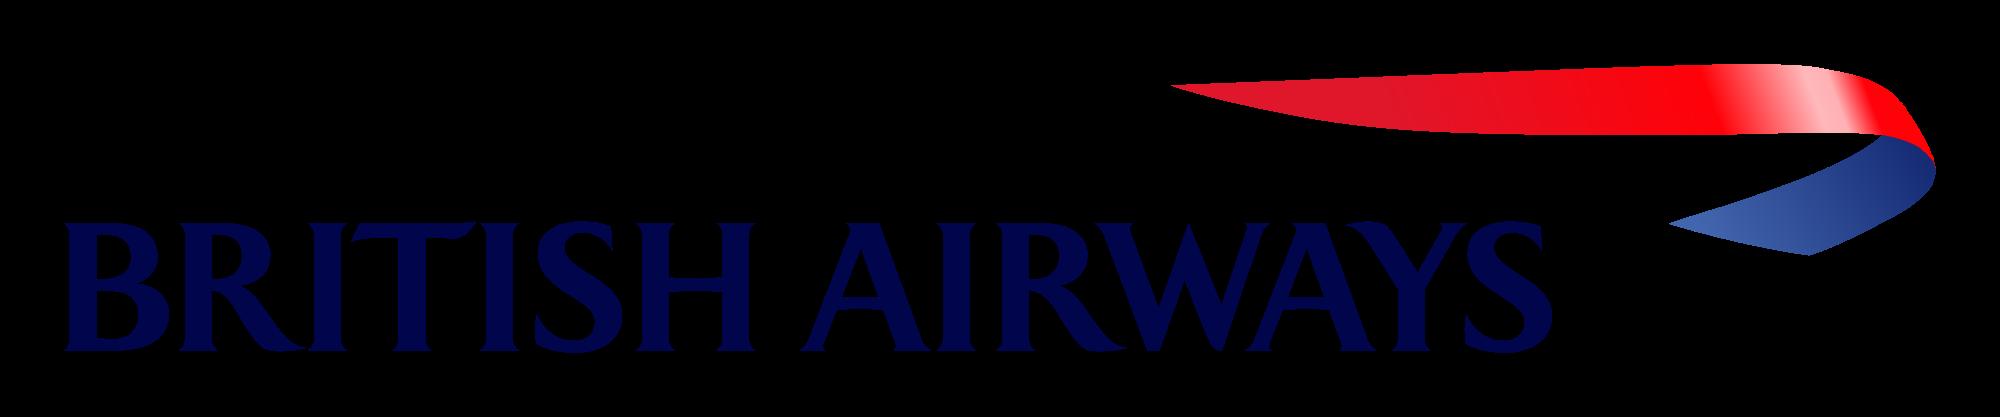 British Airways Logo PNG - 38959